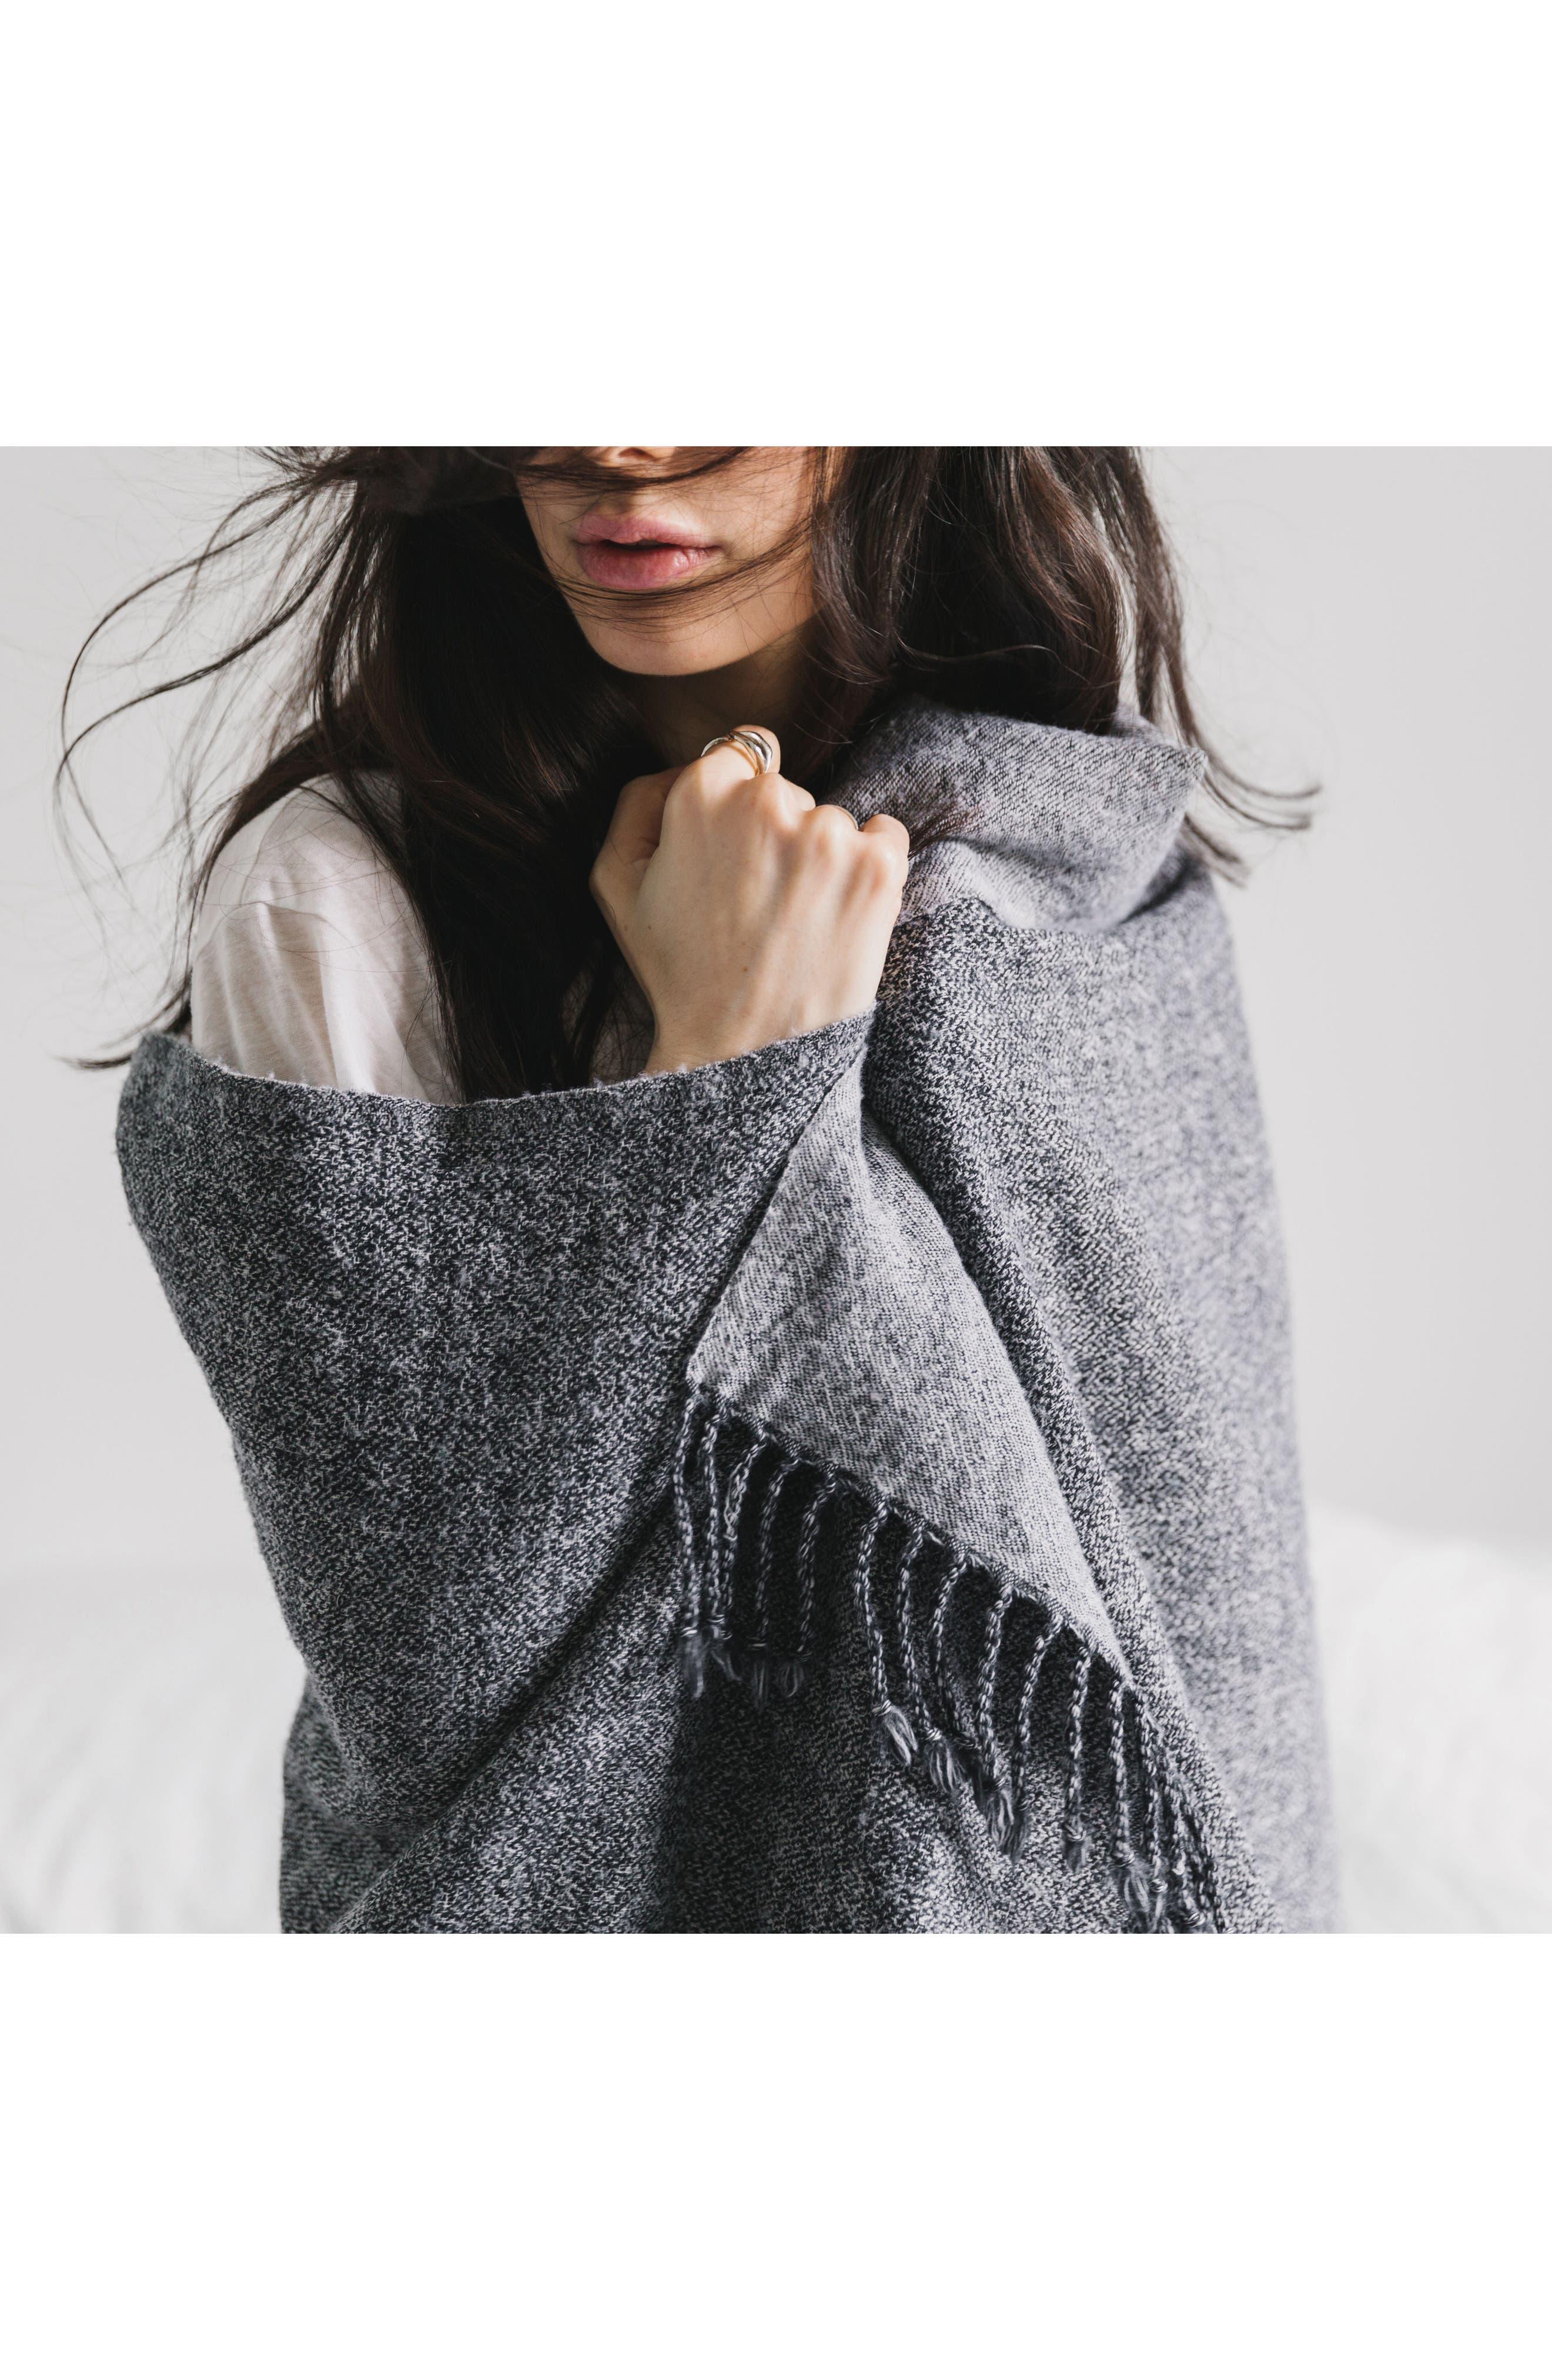 Blurred Herringbone Merino Wool Throw,                             Alternate thumbnail 2, color,                             Blurred Herringbone Grey